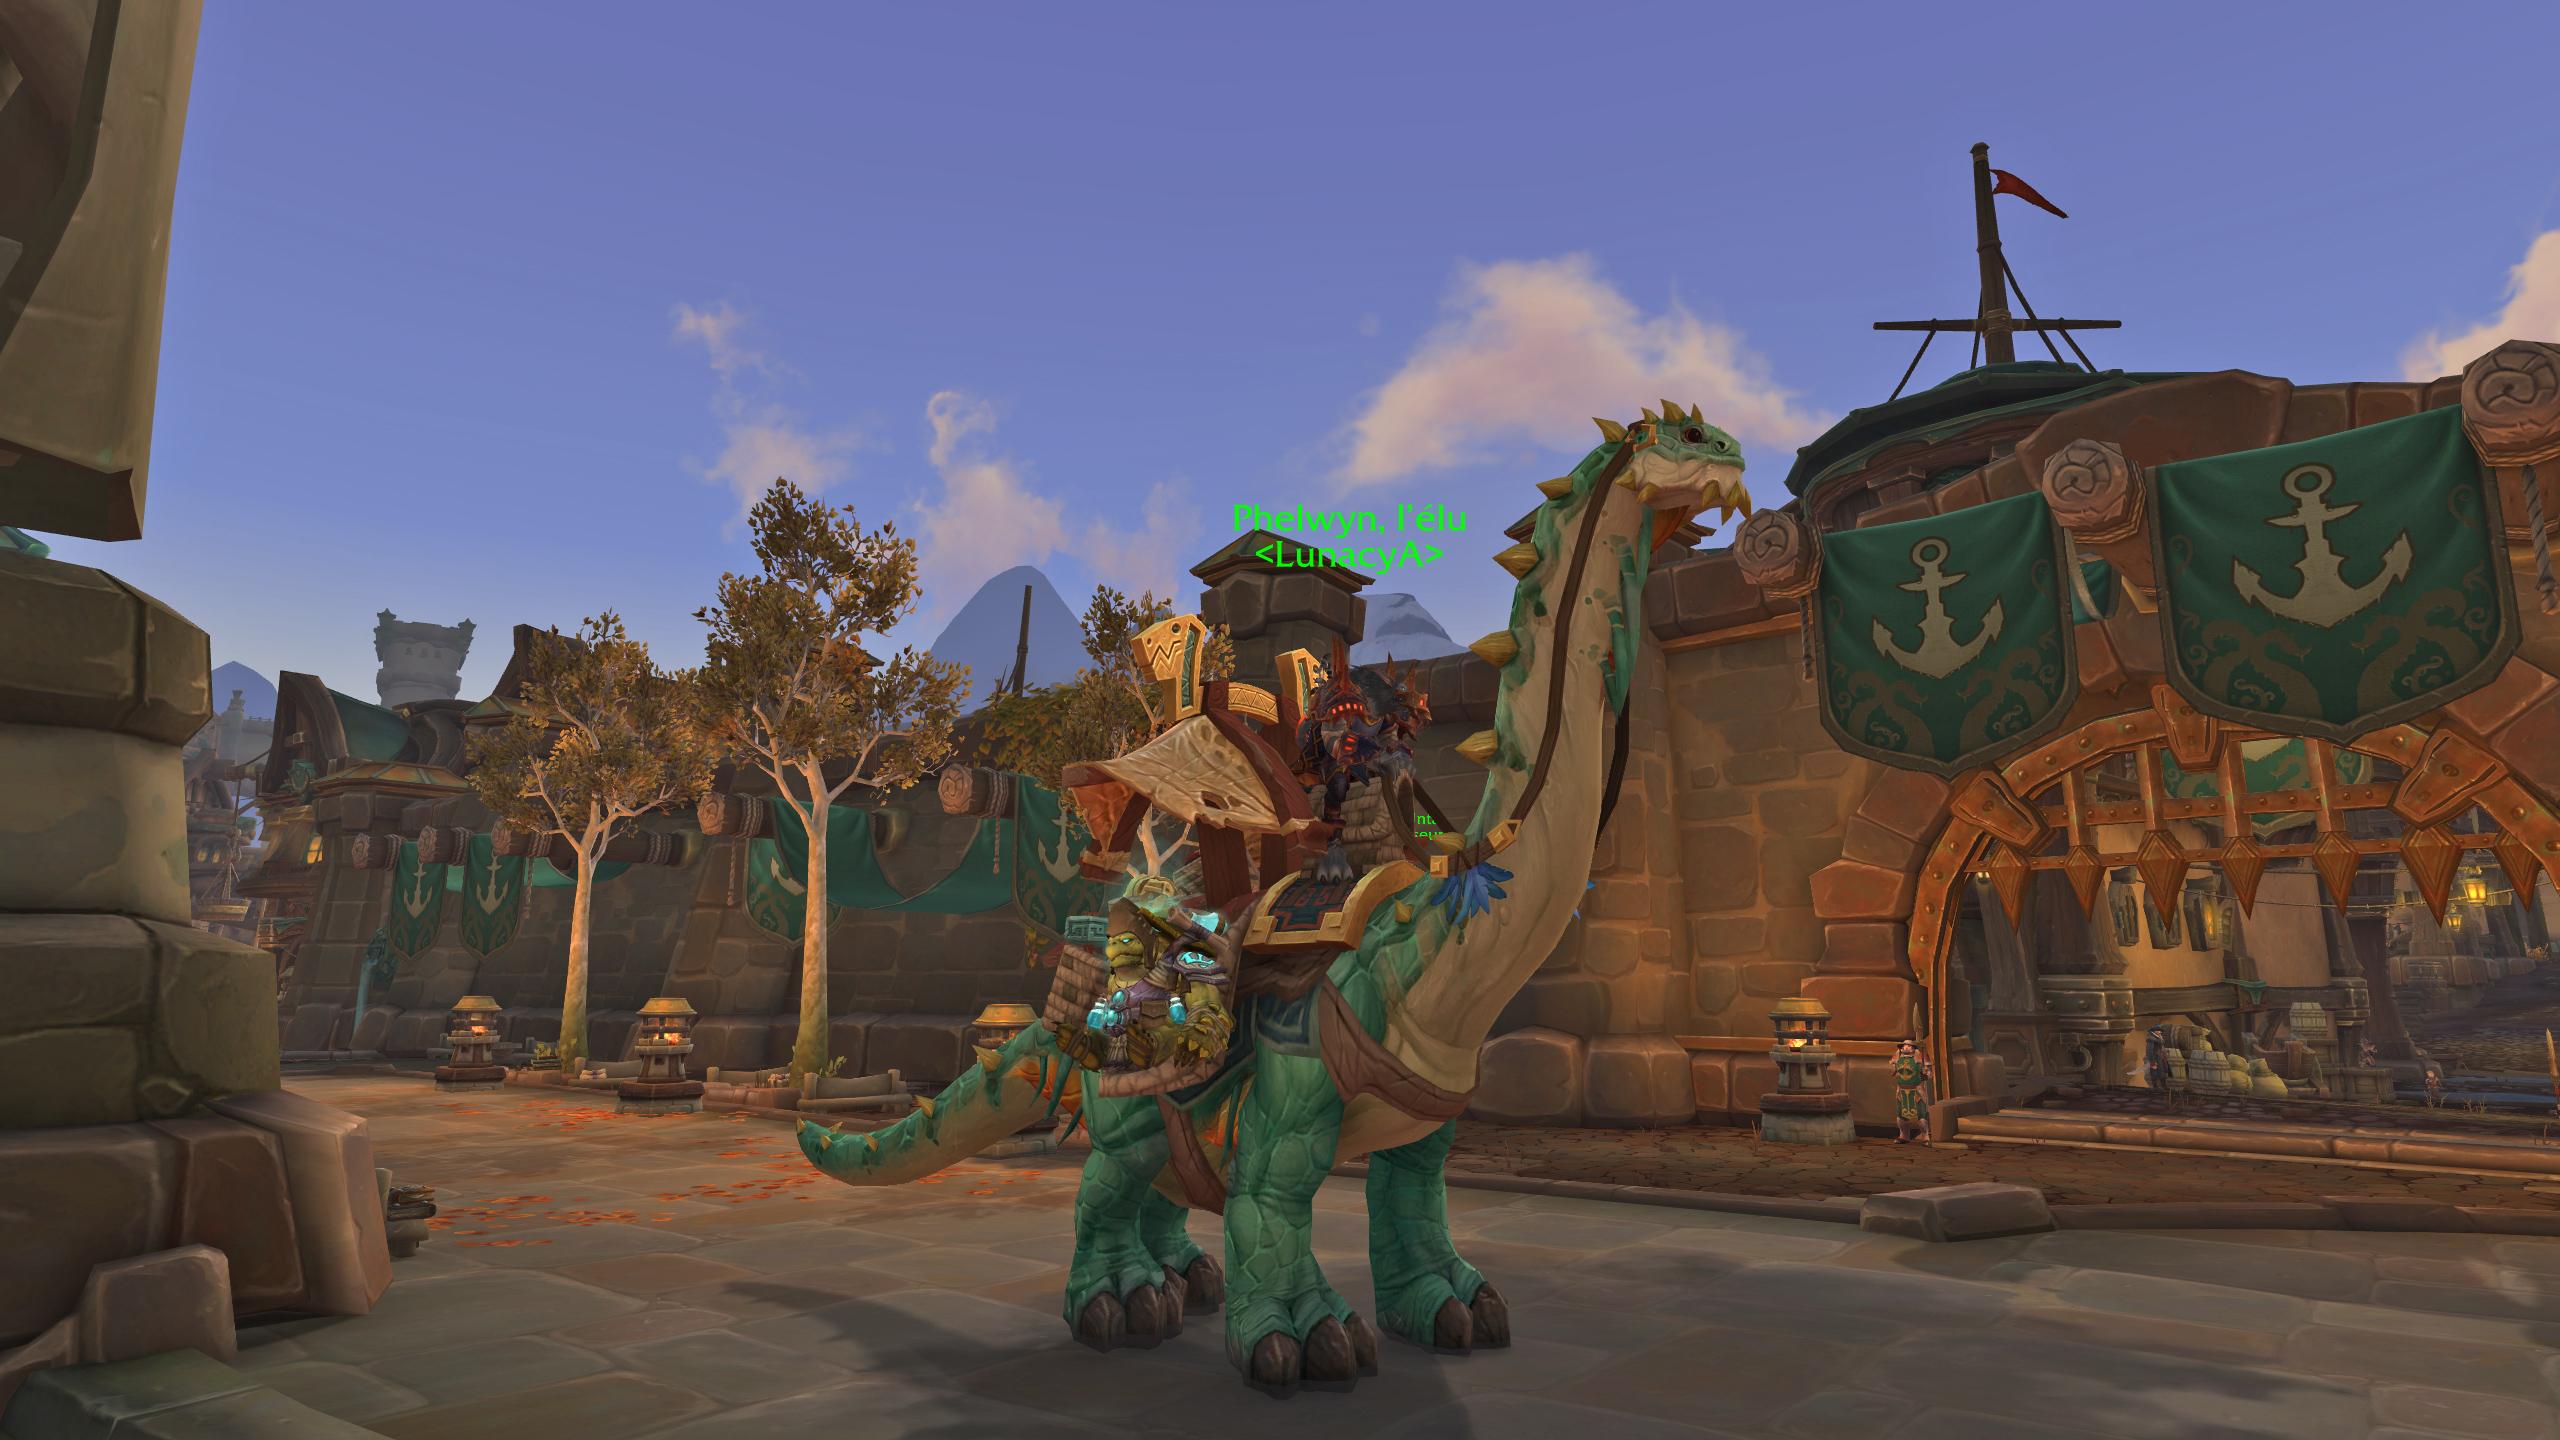 Screenshot de World of Warcraft: Battle for Azeroth réalisé par Phelwyn.